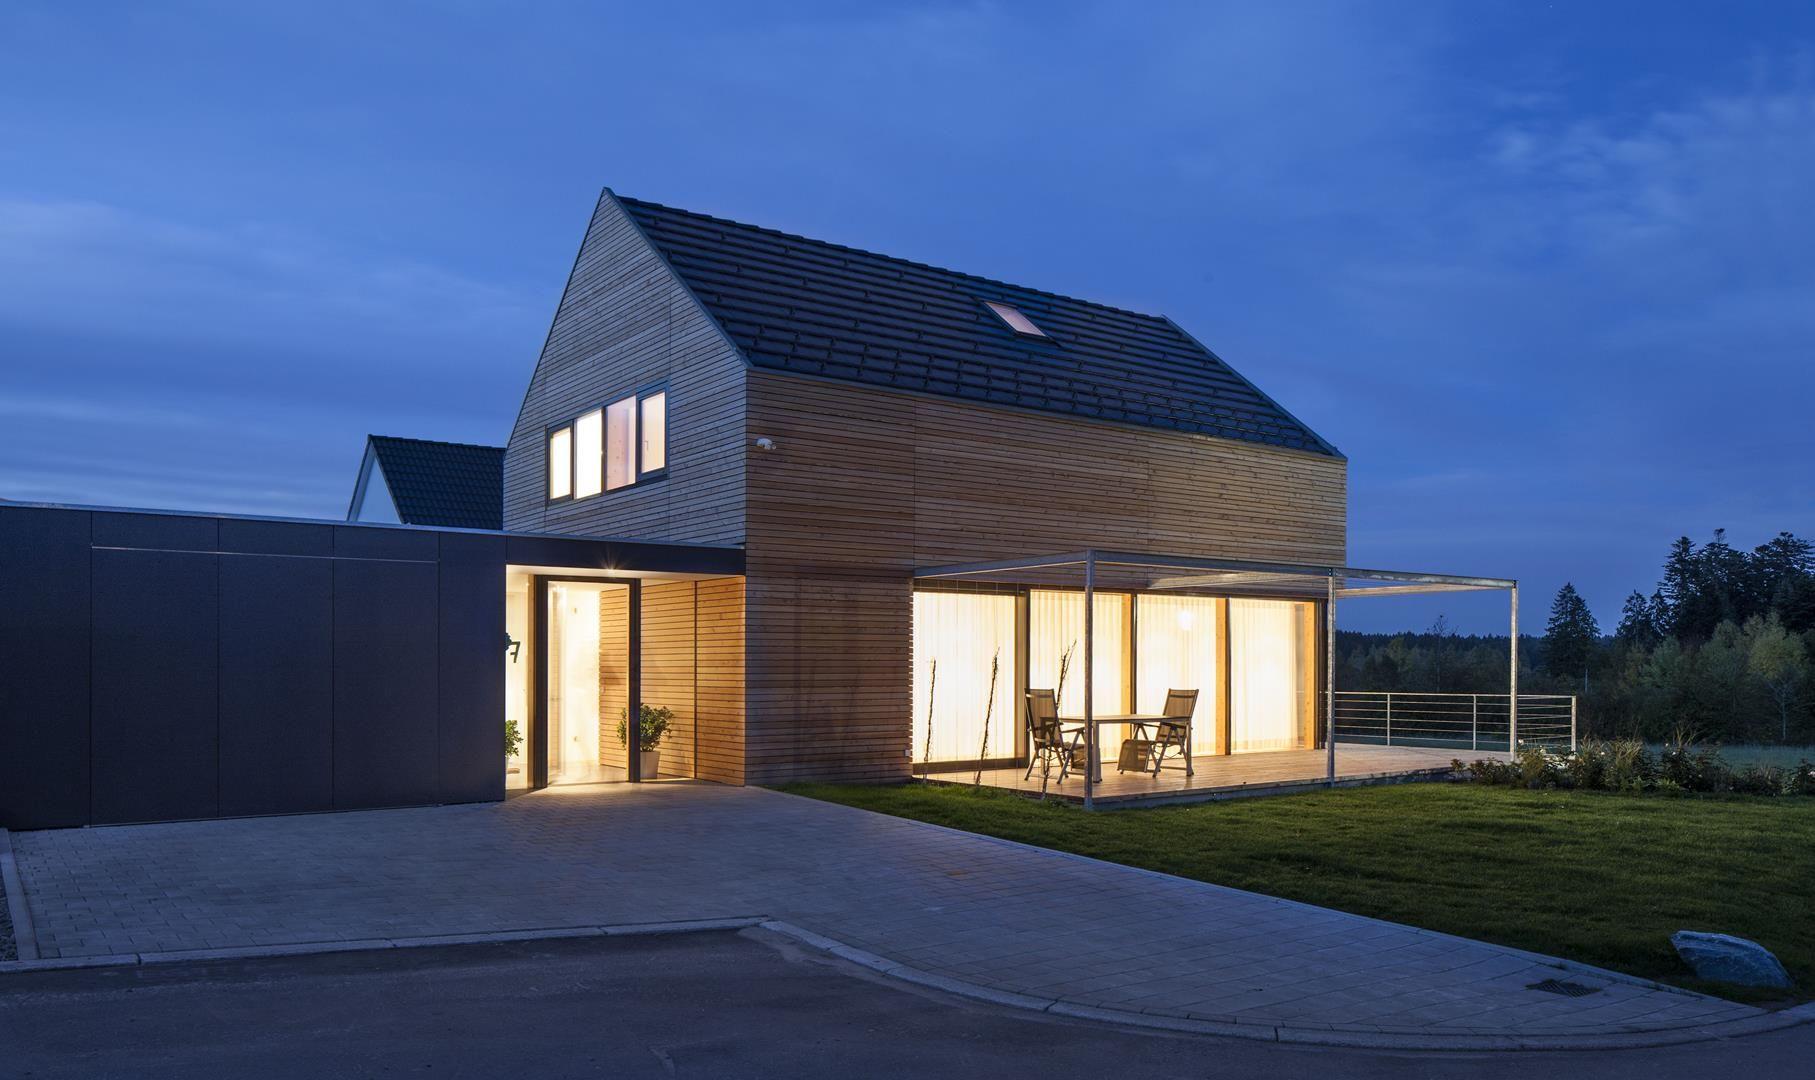 Holzhaus modern villingen 03 haus pinterest modernes for Modernes haus in hanglage